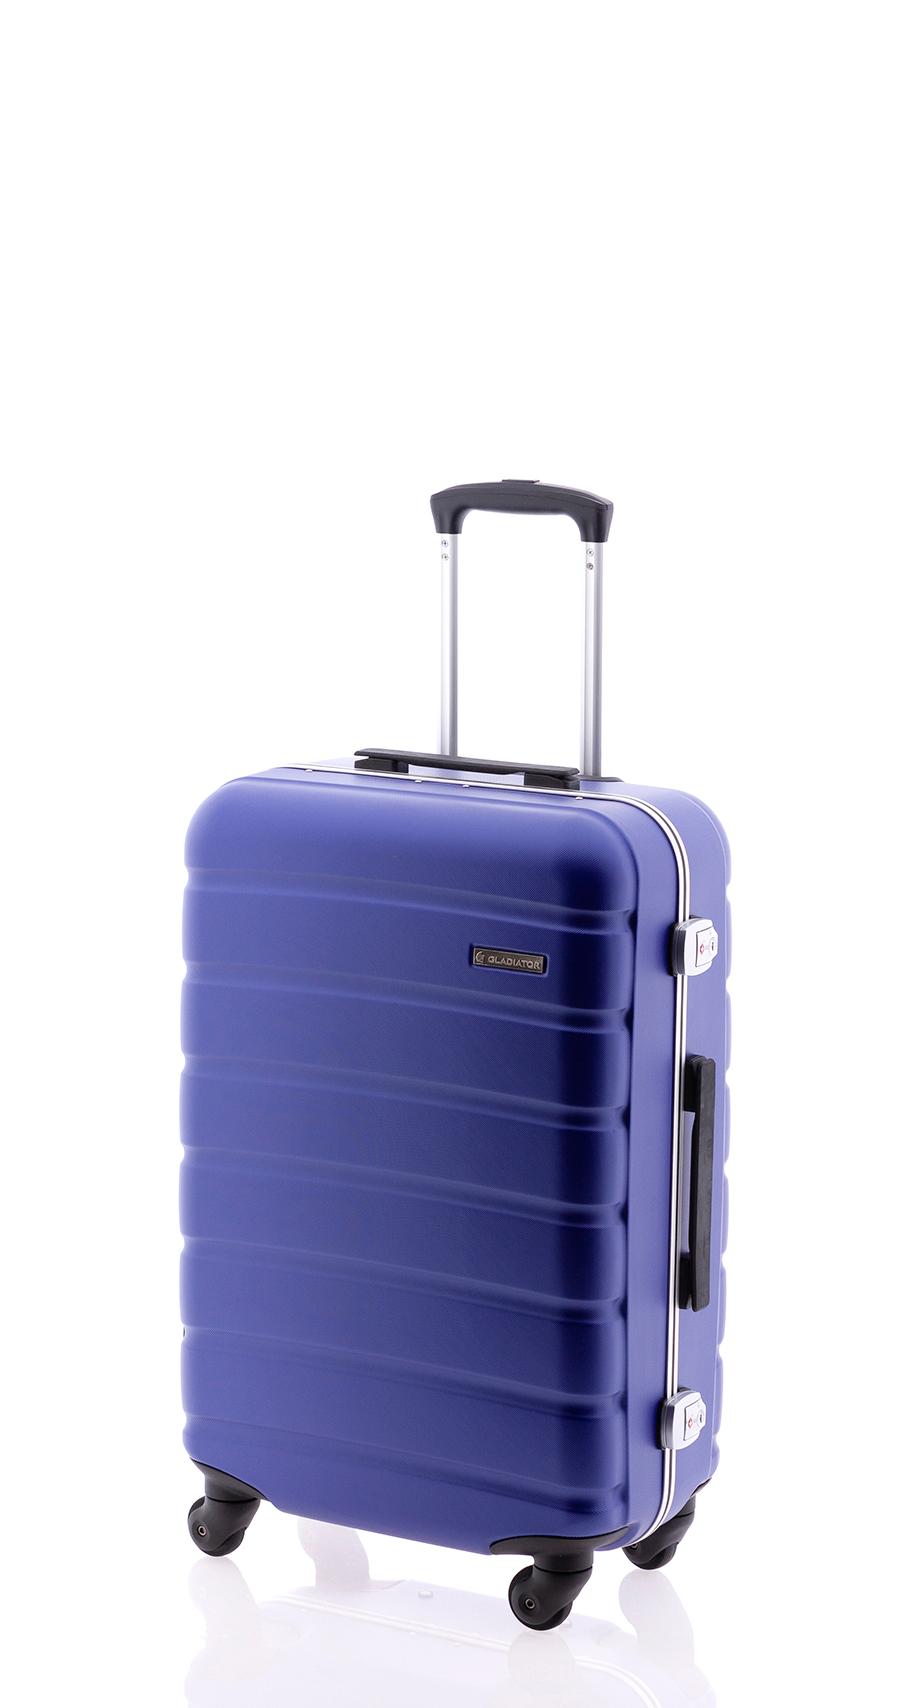 maletas-gladiator-leria-mediana-261100